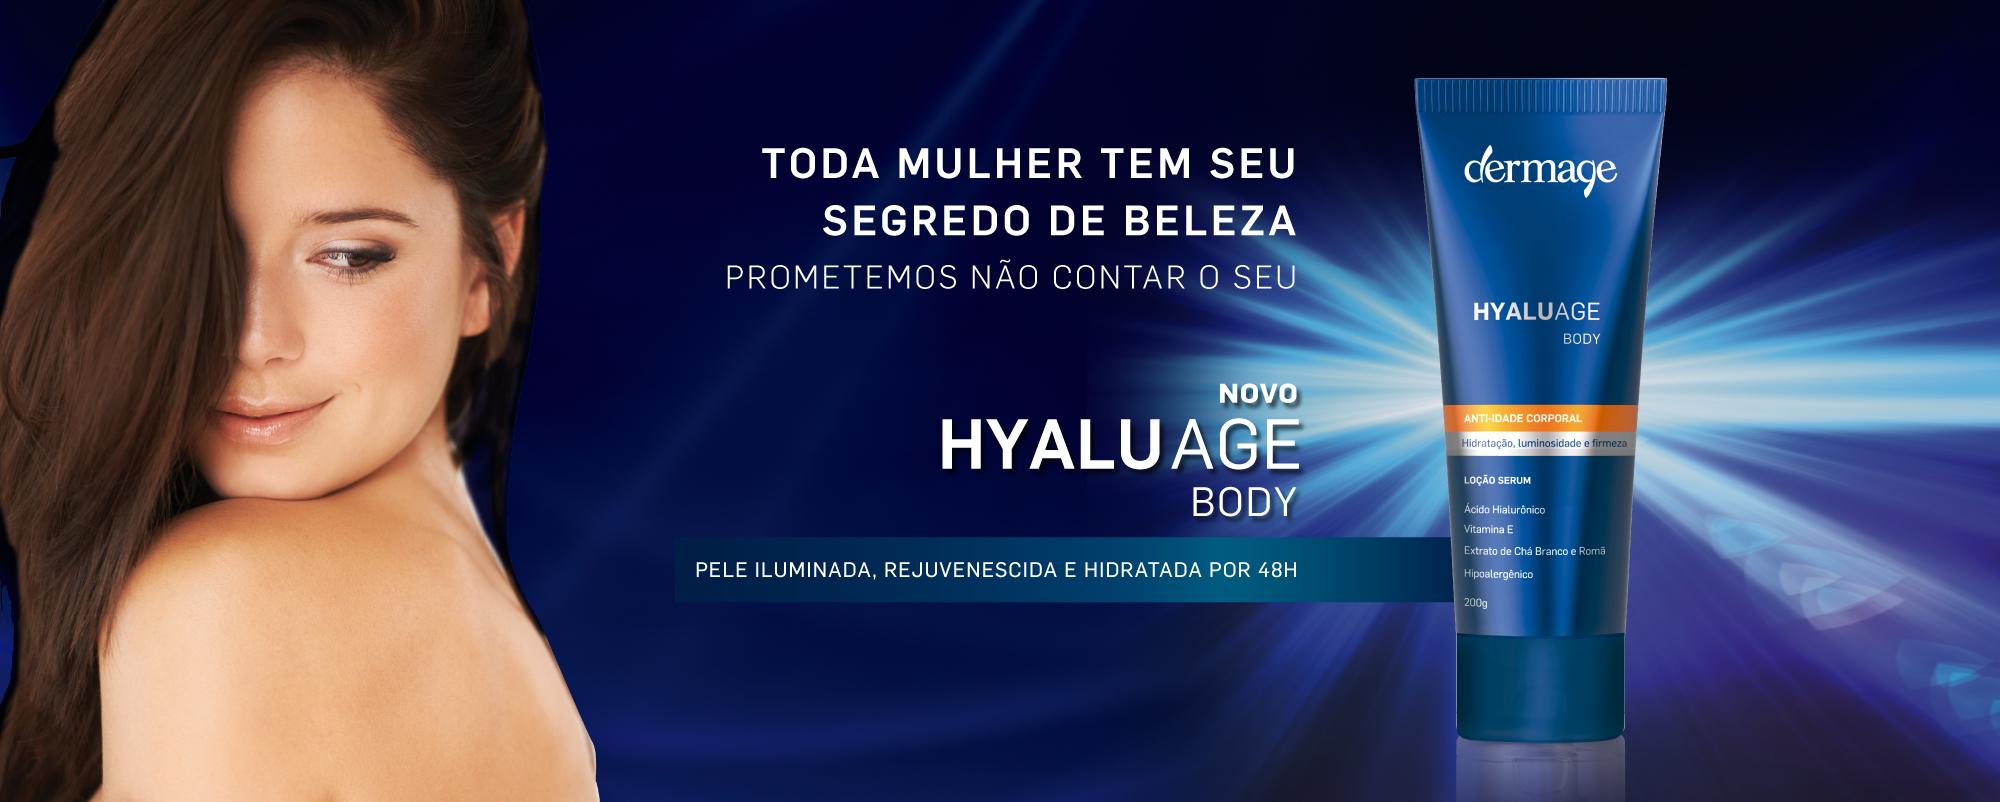 Hyaluage Body